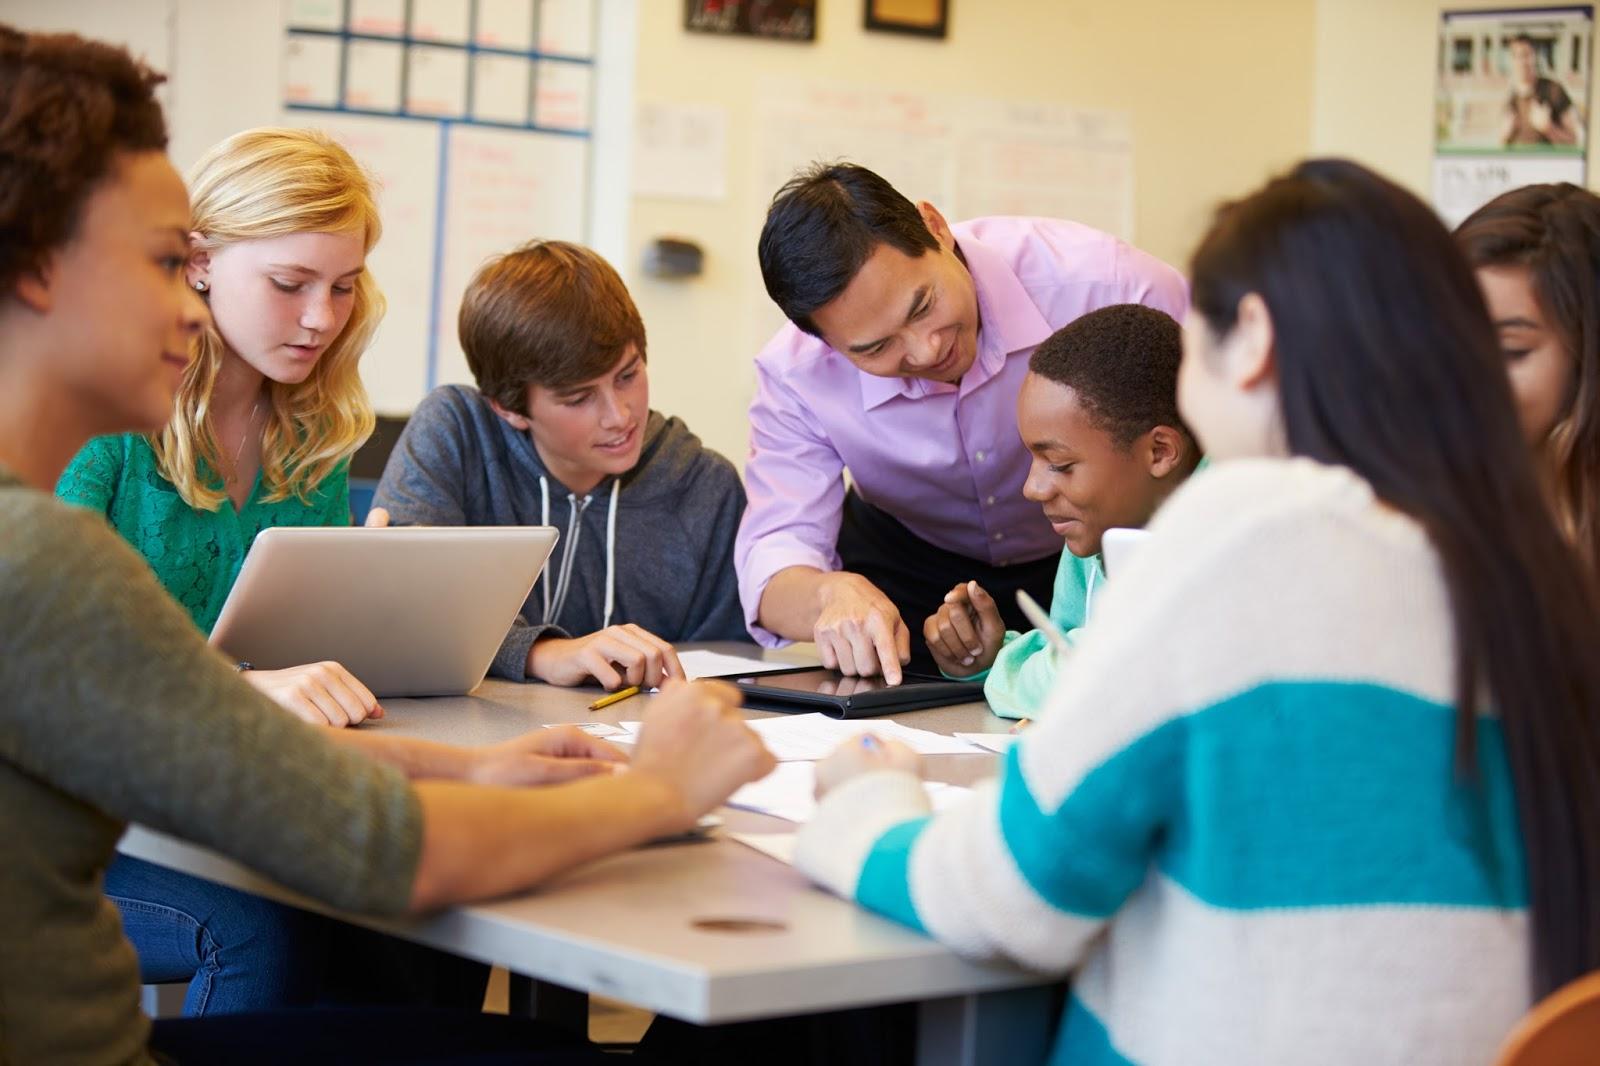 Teachers in the Classroom